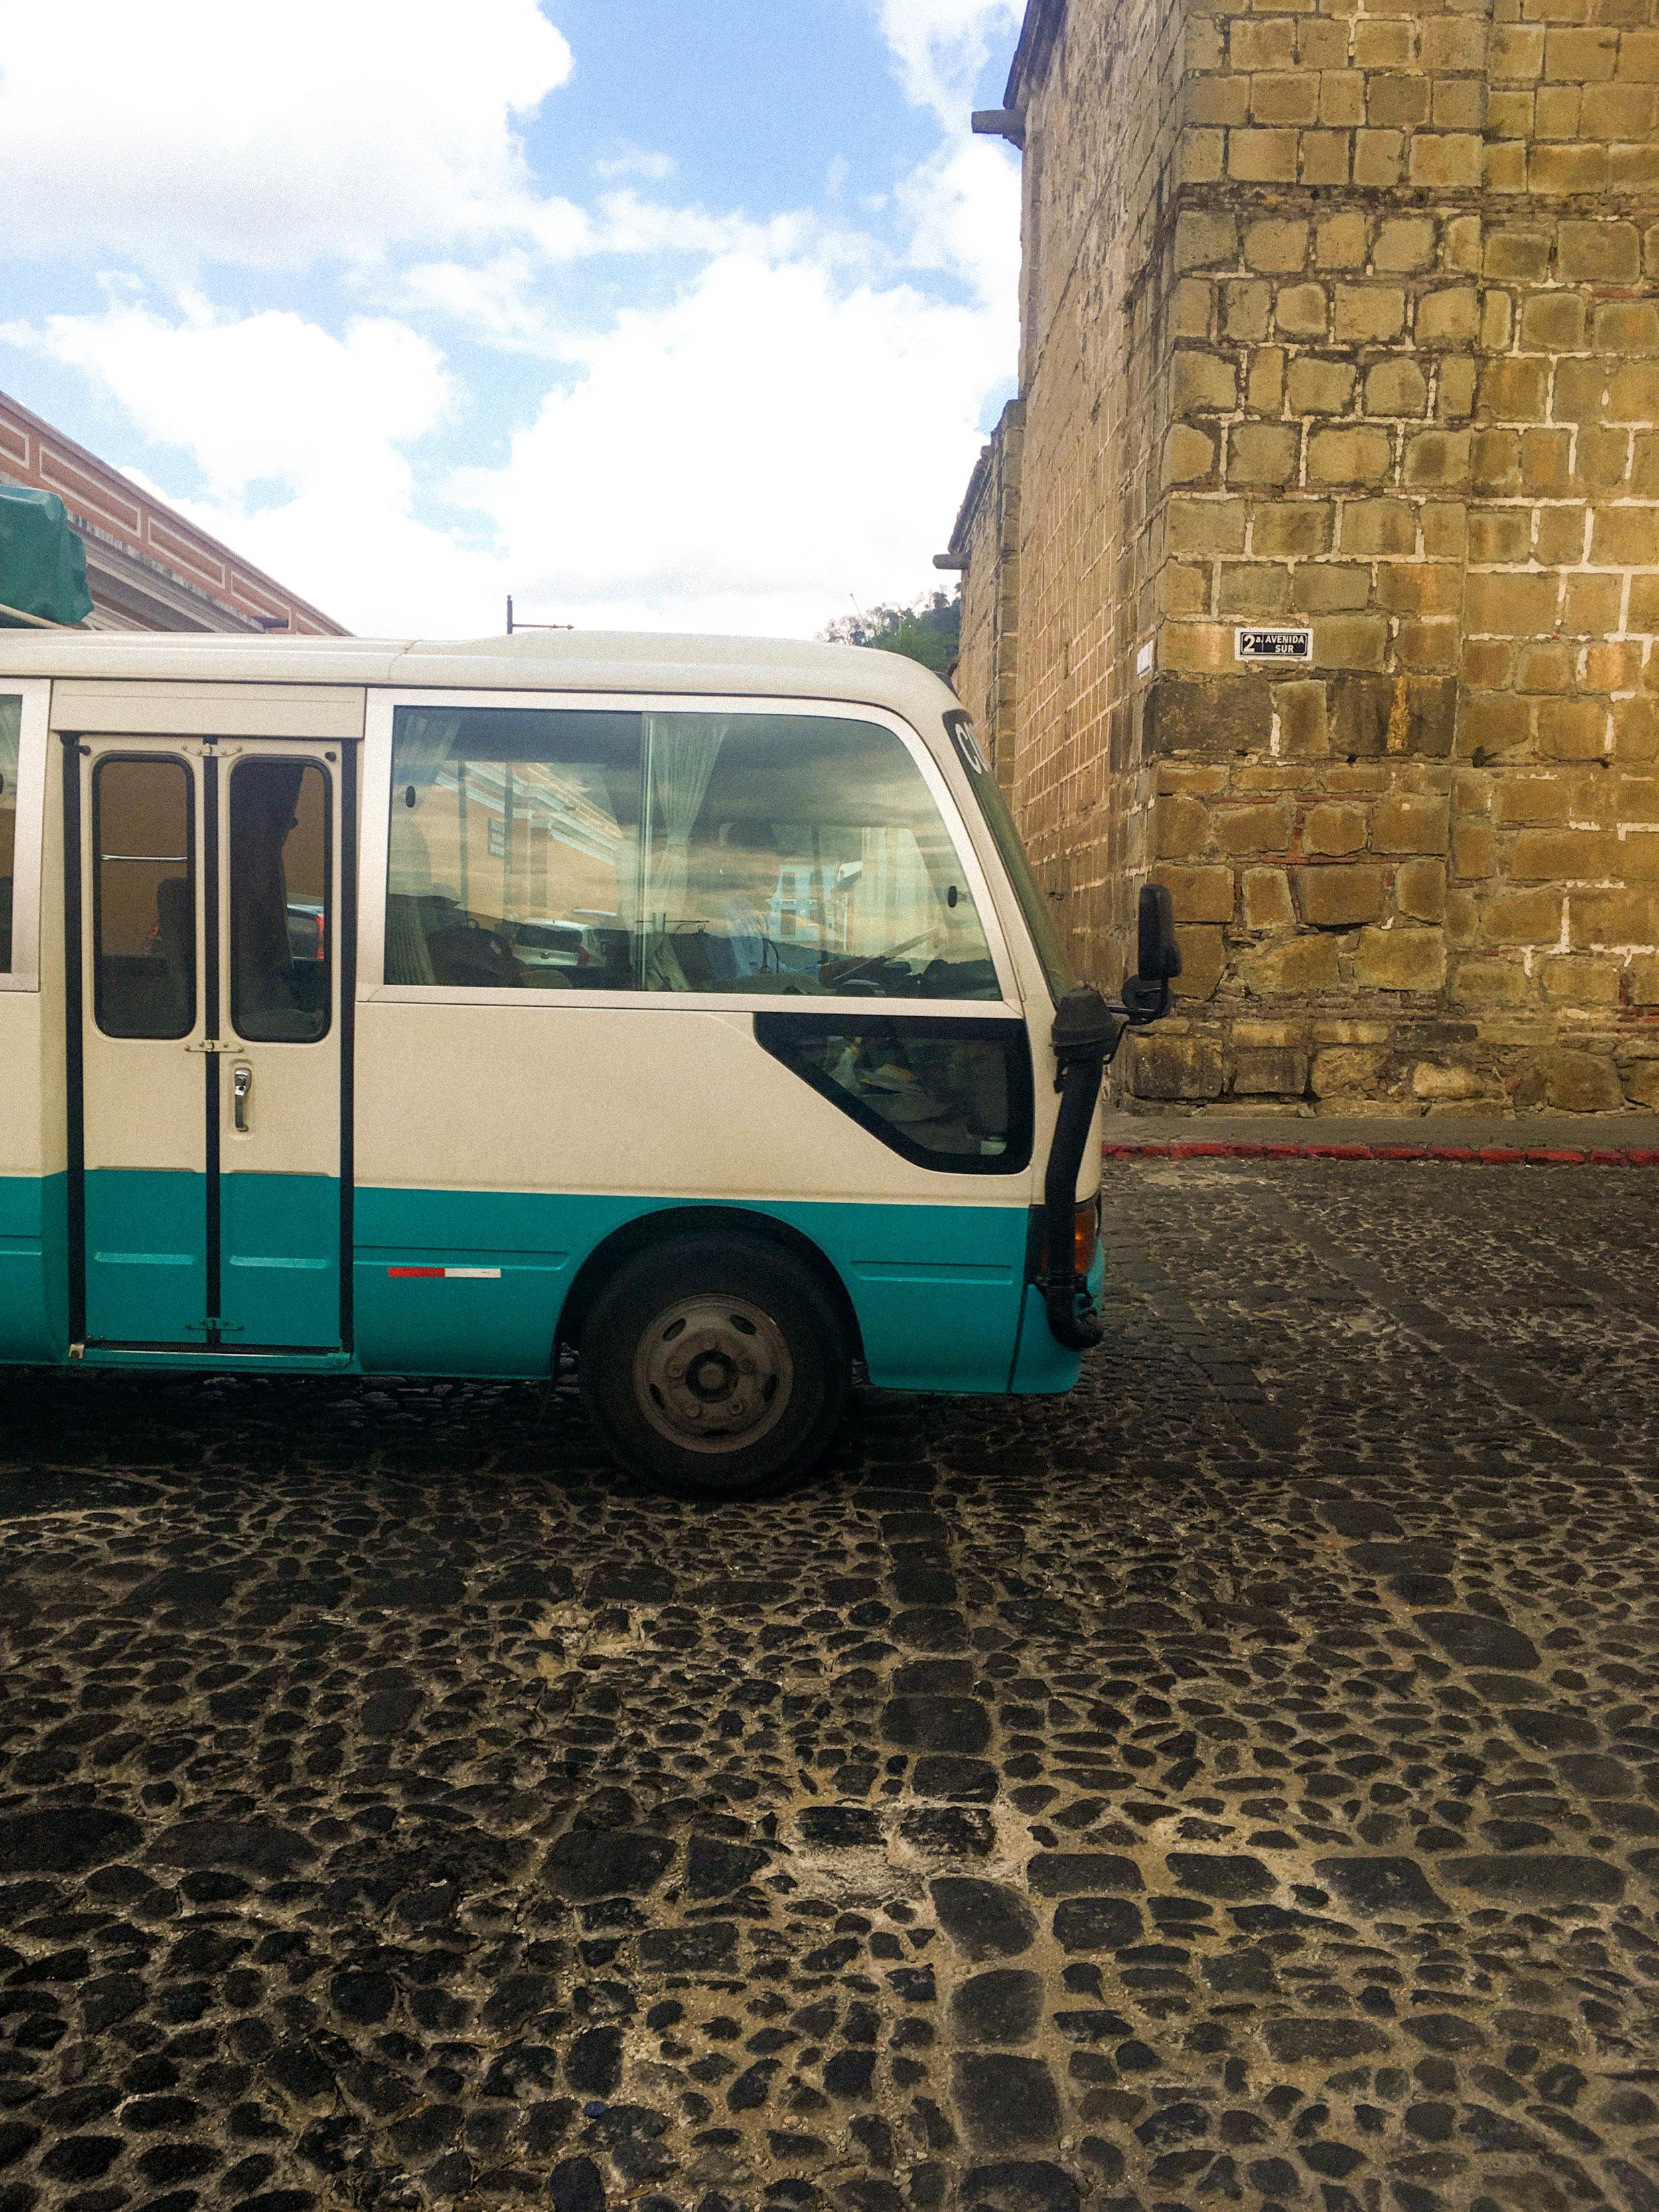 Antigua- Bus-natalienehlawi.com.jpg